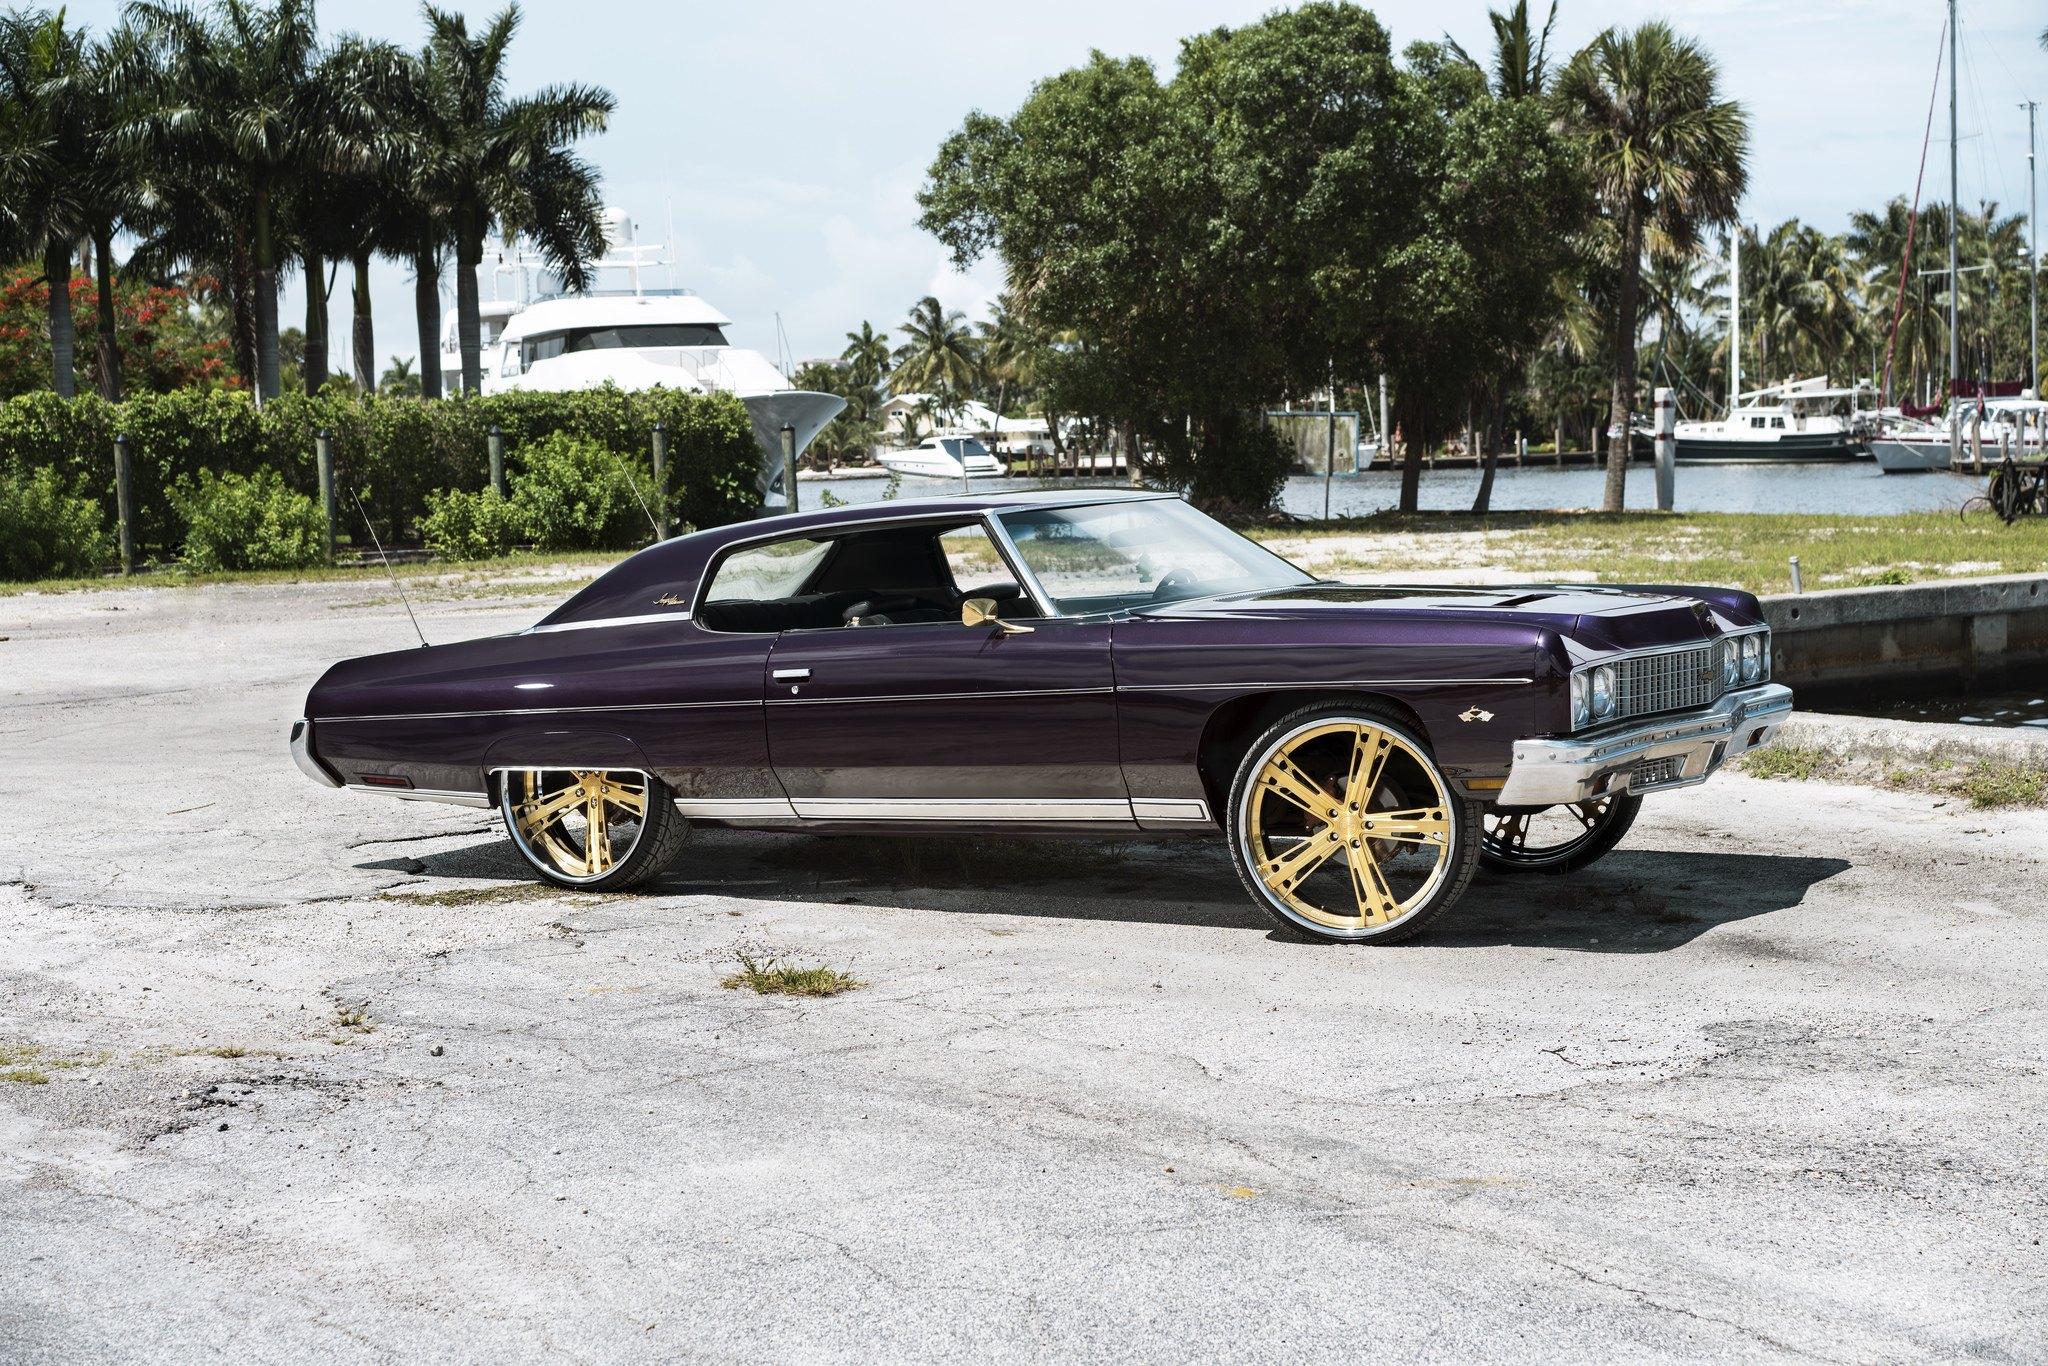 Eggplant Purple Chevy Impala Donk on Gold Wheels — CARiD com